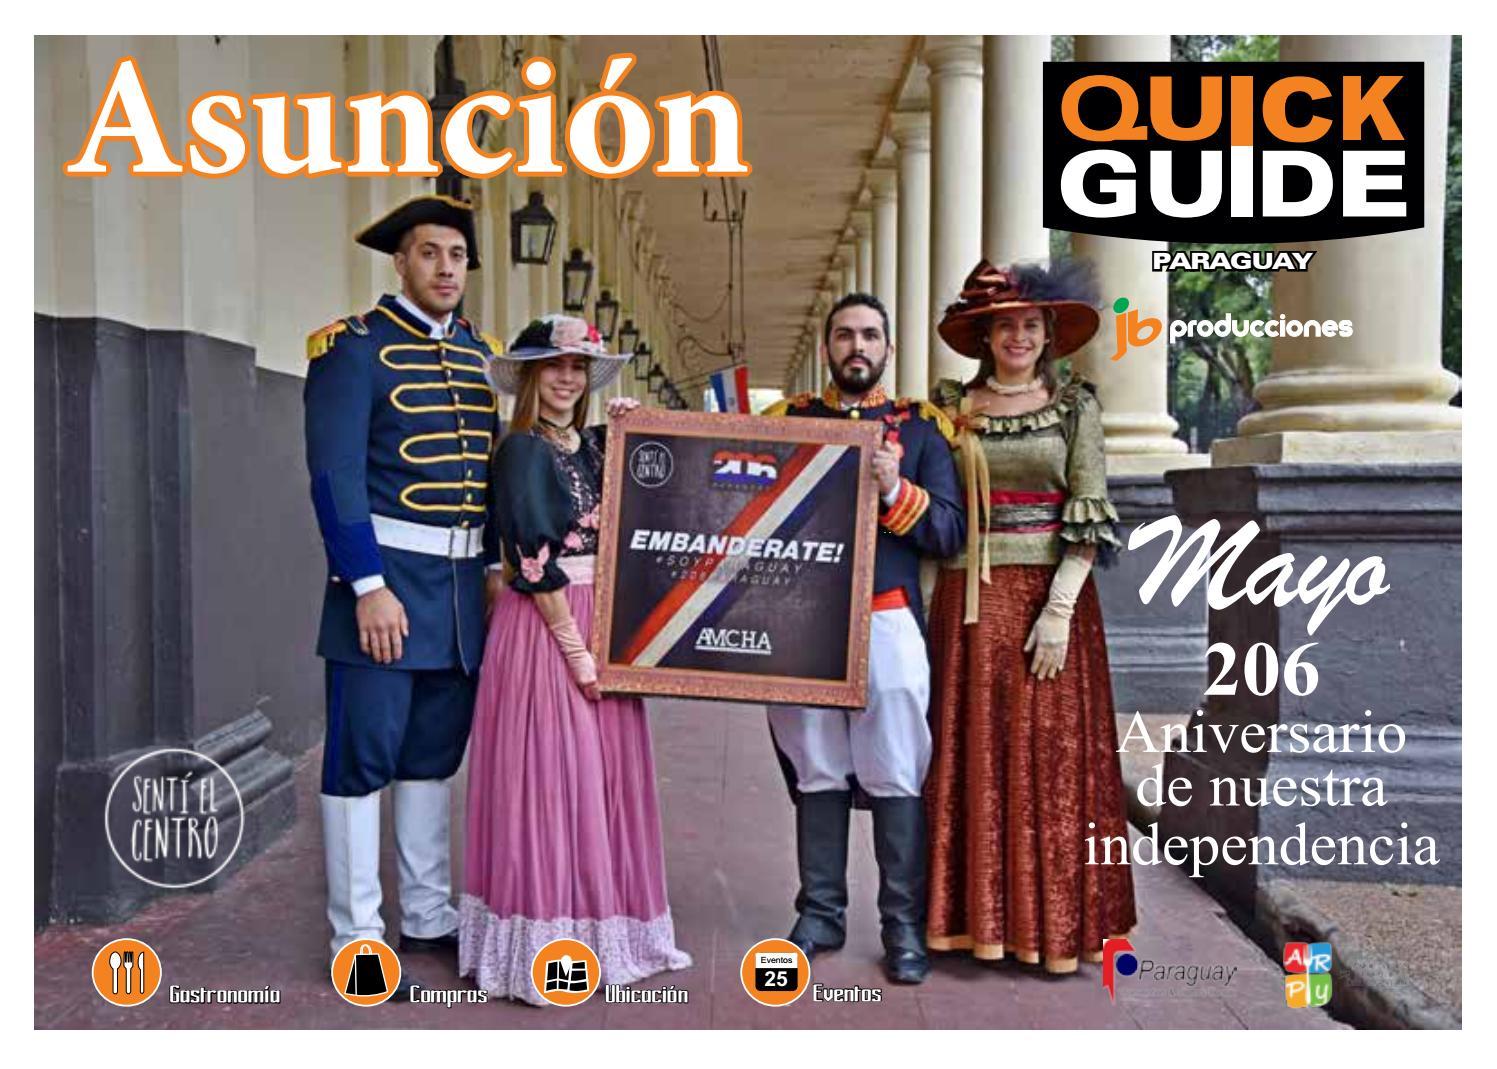 Muebles Narciso Caaguazu - Gu A R Pida Gu A R Pida Asunci N Paraguay Edici N Mayo Junio [mjhdah]https://image.isu.pub/170711113559-e1fdb0290718b1c48a539cb380a61ccf/jpg/page_1.jpg